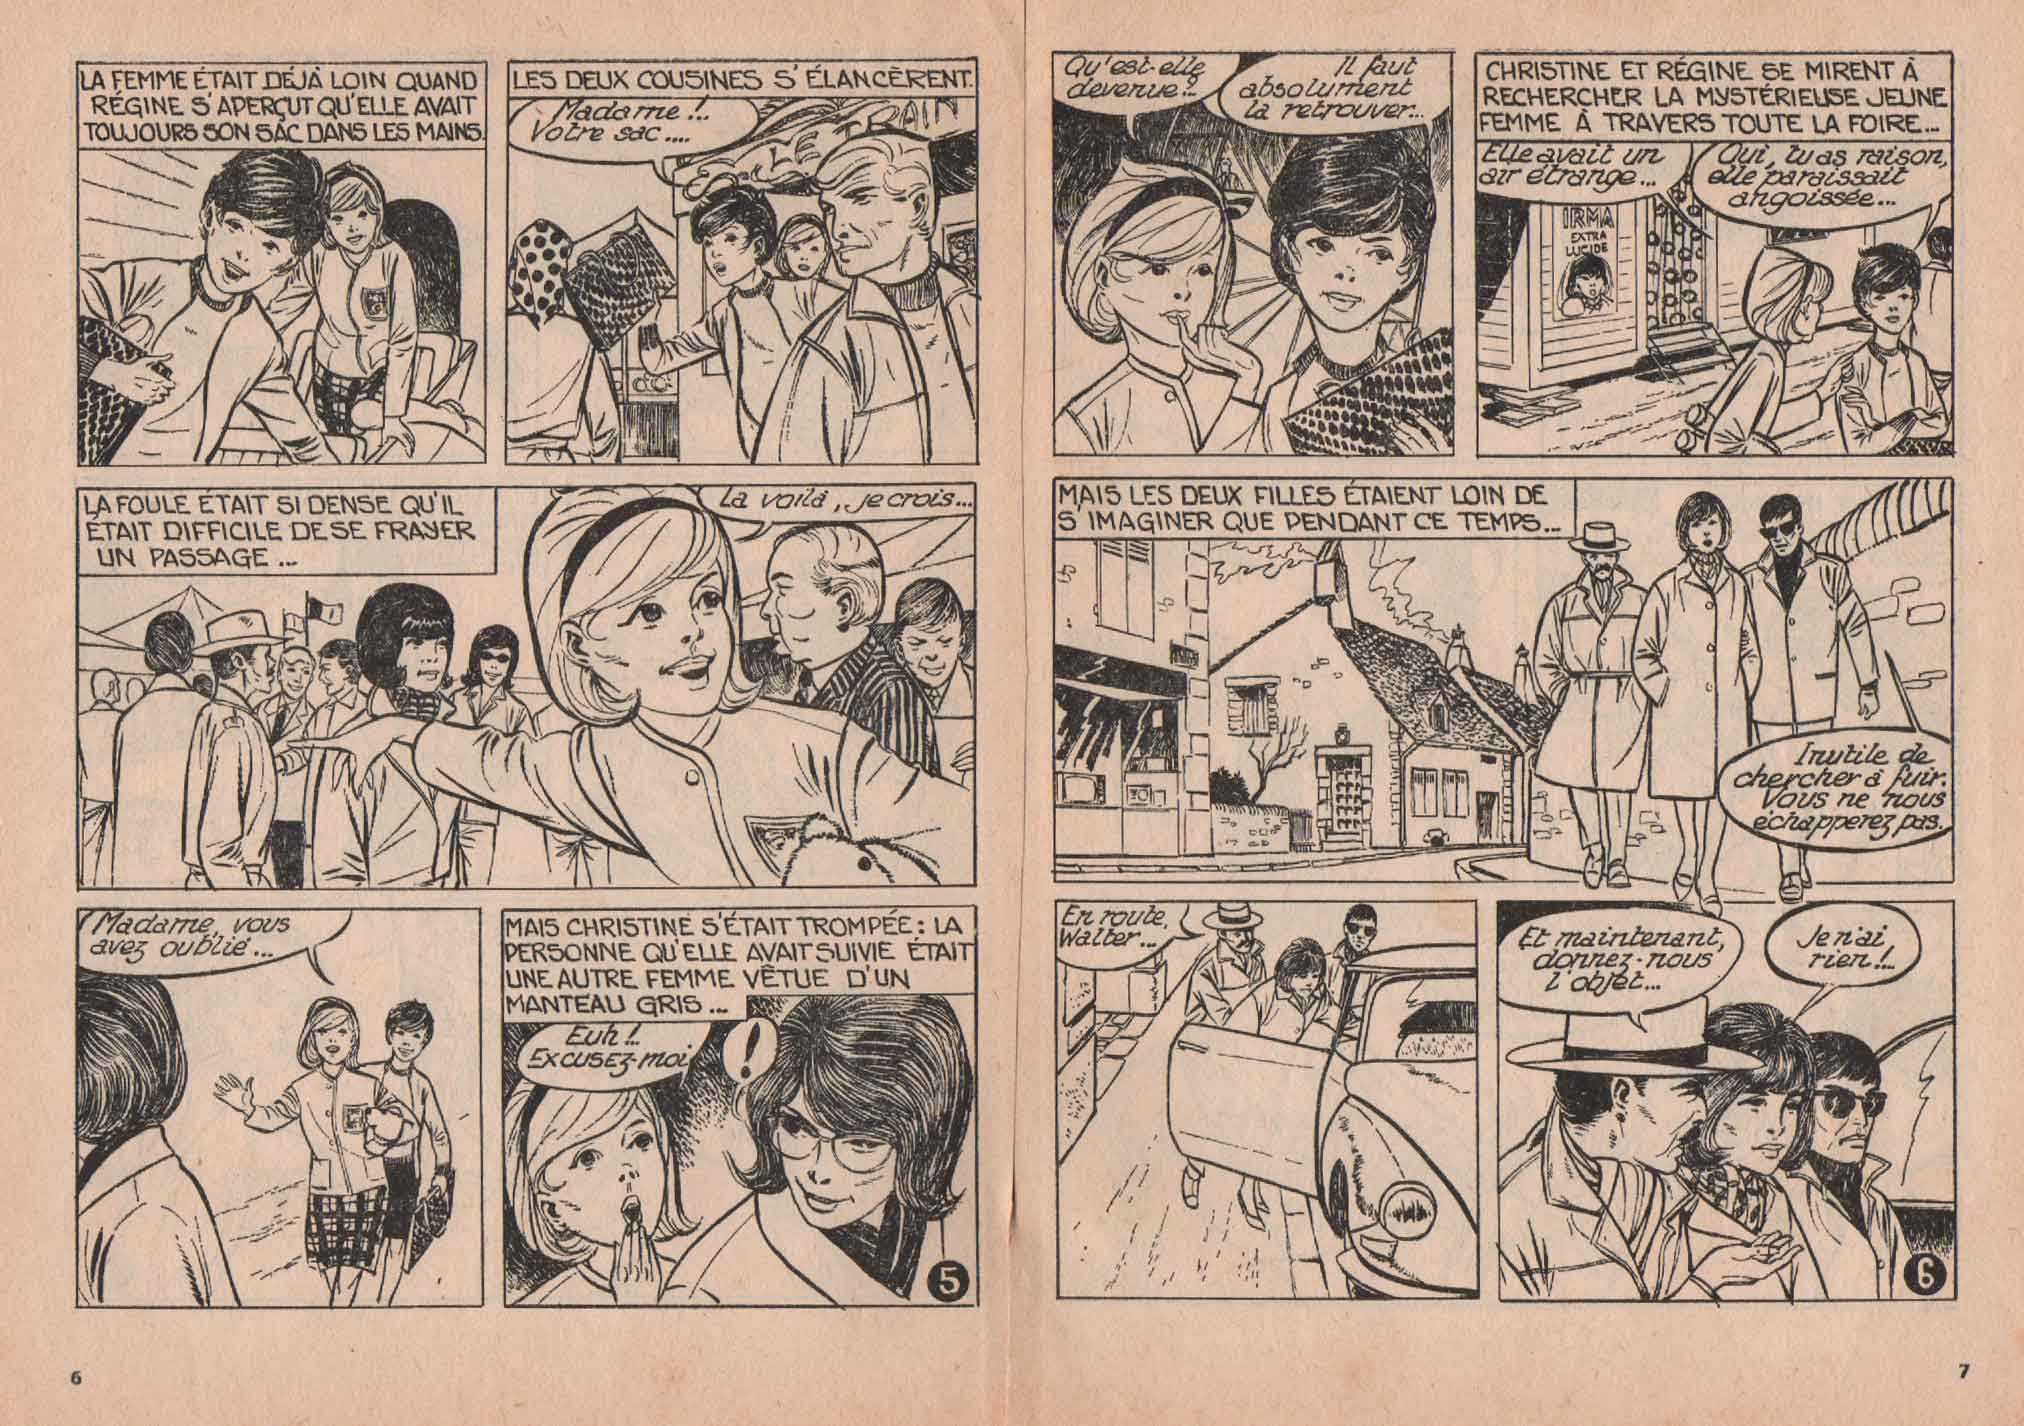 « La Femme en gris » Lisette magazine n° 37 (11/1965).